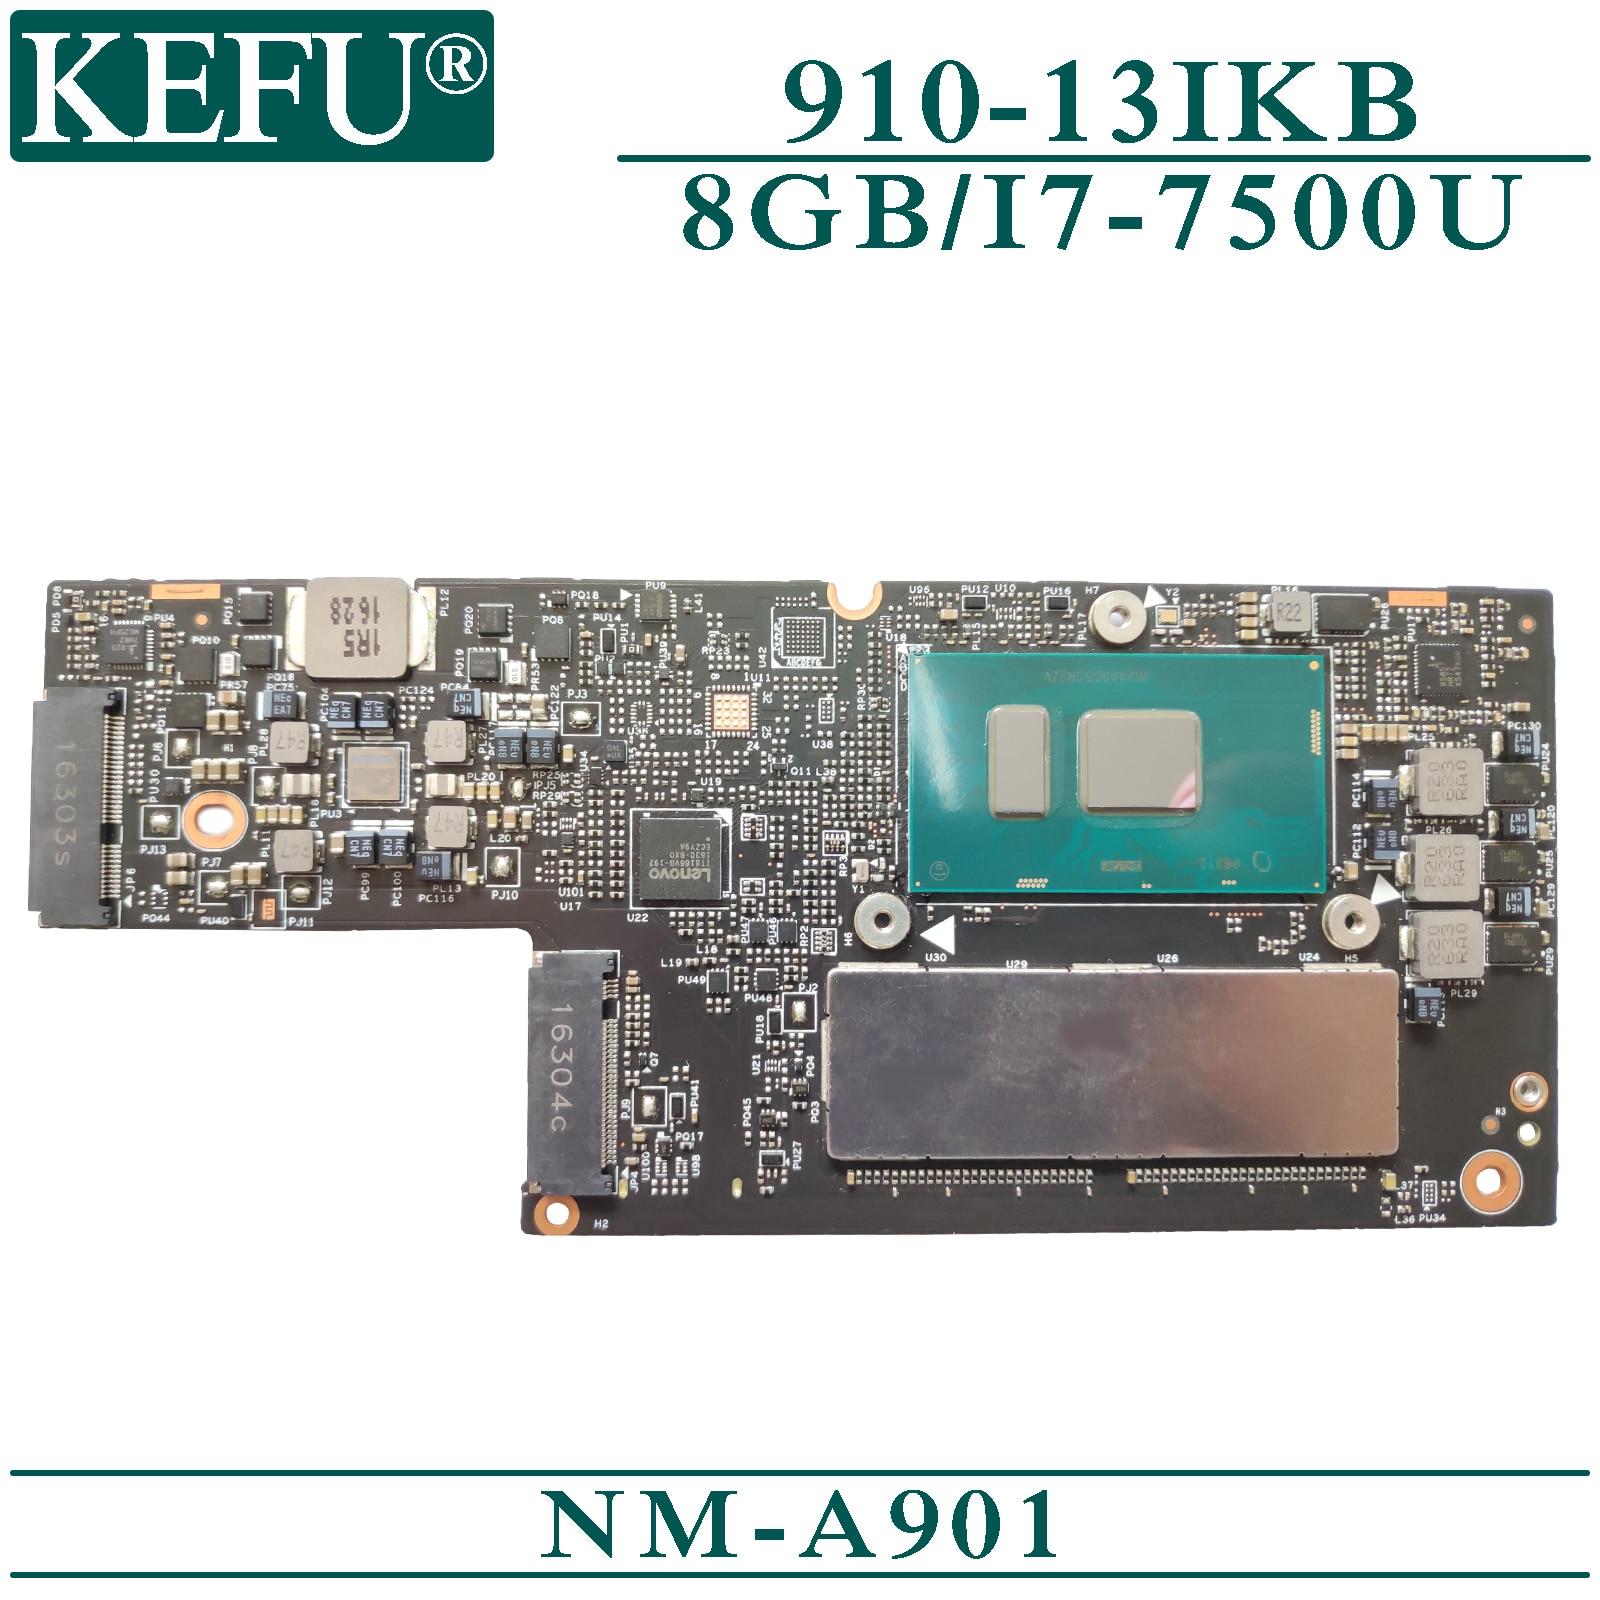 KEFU NM-A901 original mainboard für Lenovo YOGA 5 Pro 910-13IKB mit 8GB-RAM I7-7500U Laptop motherboard